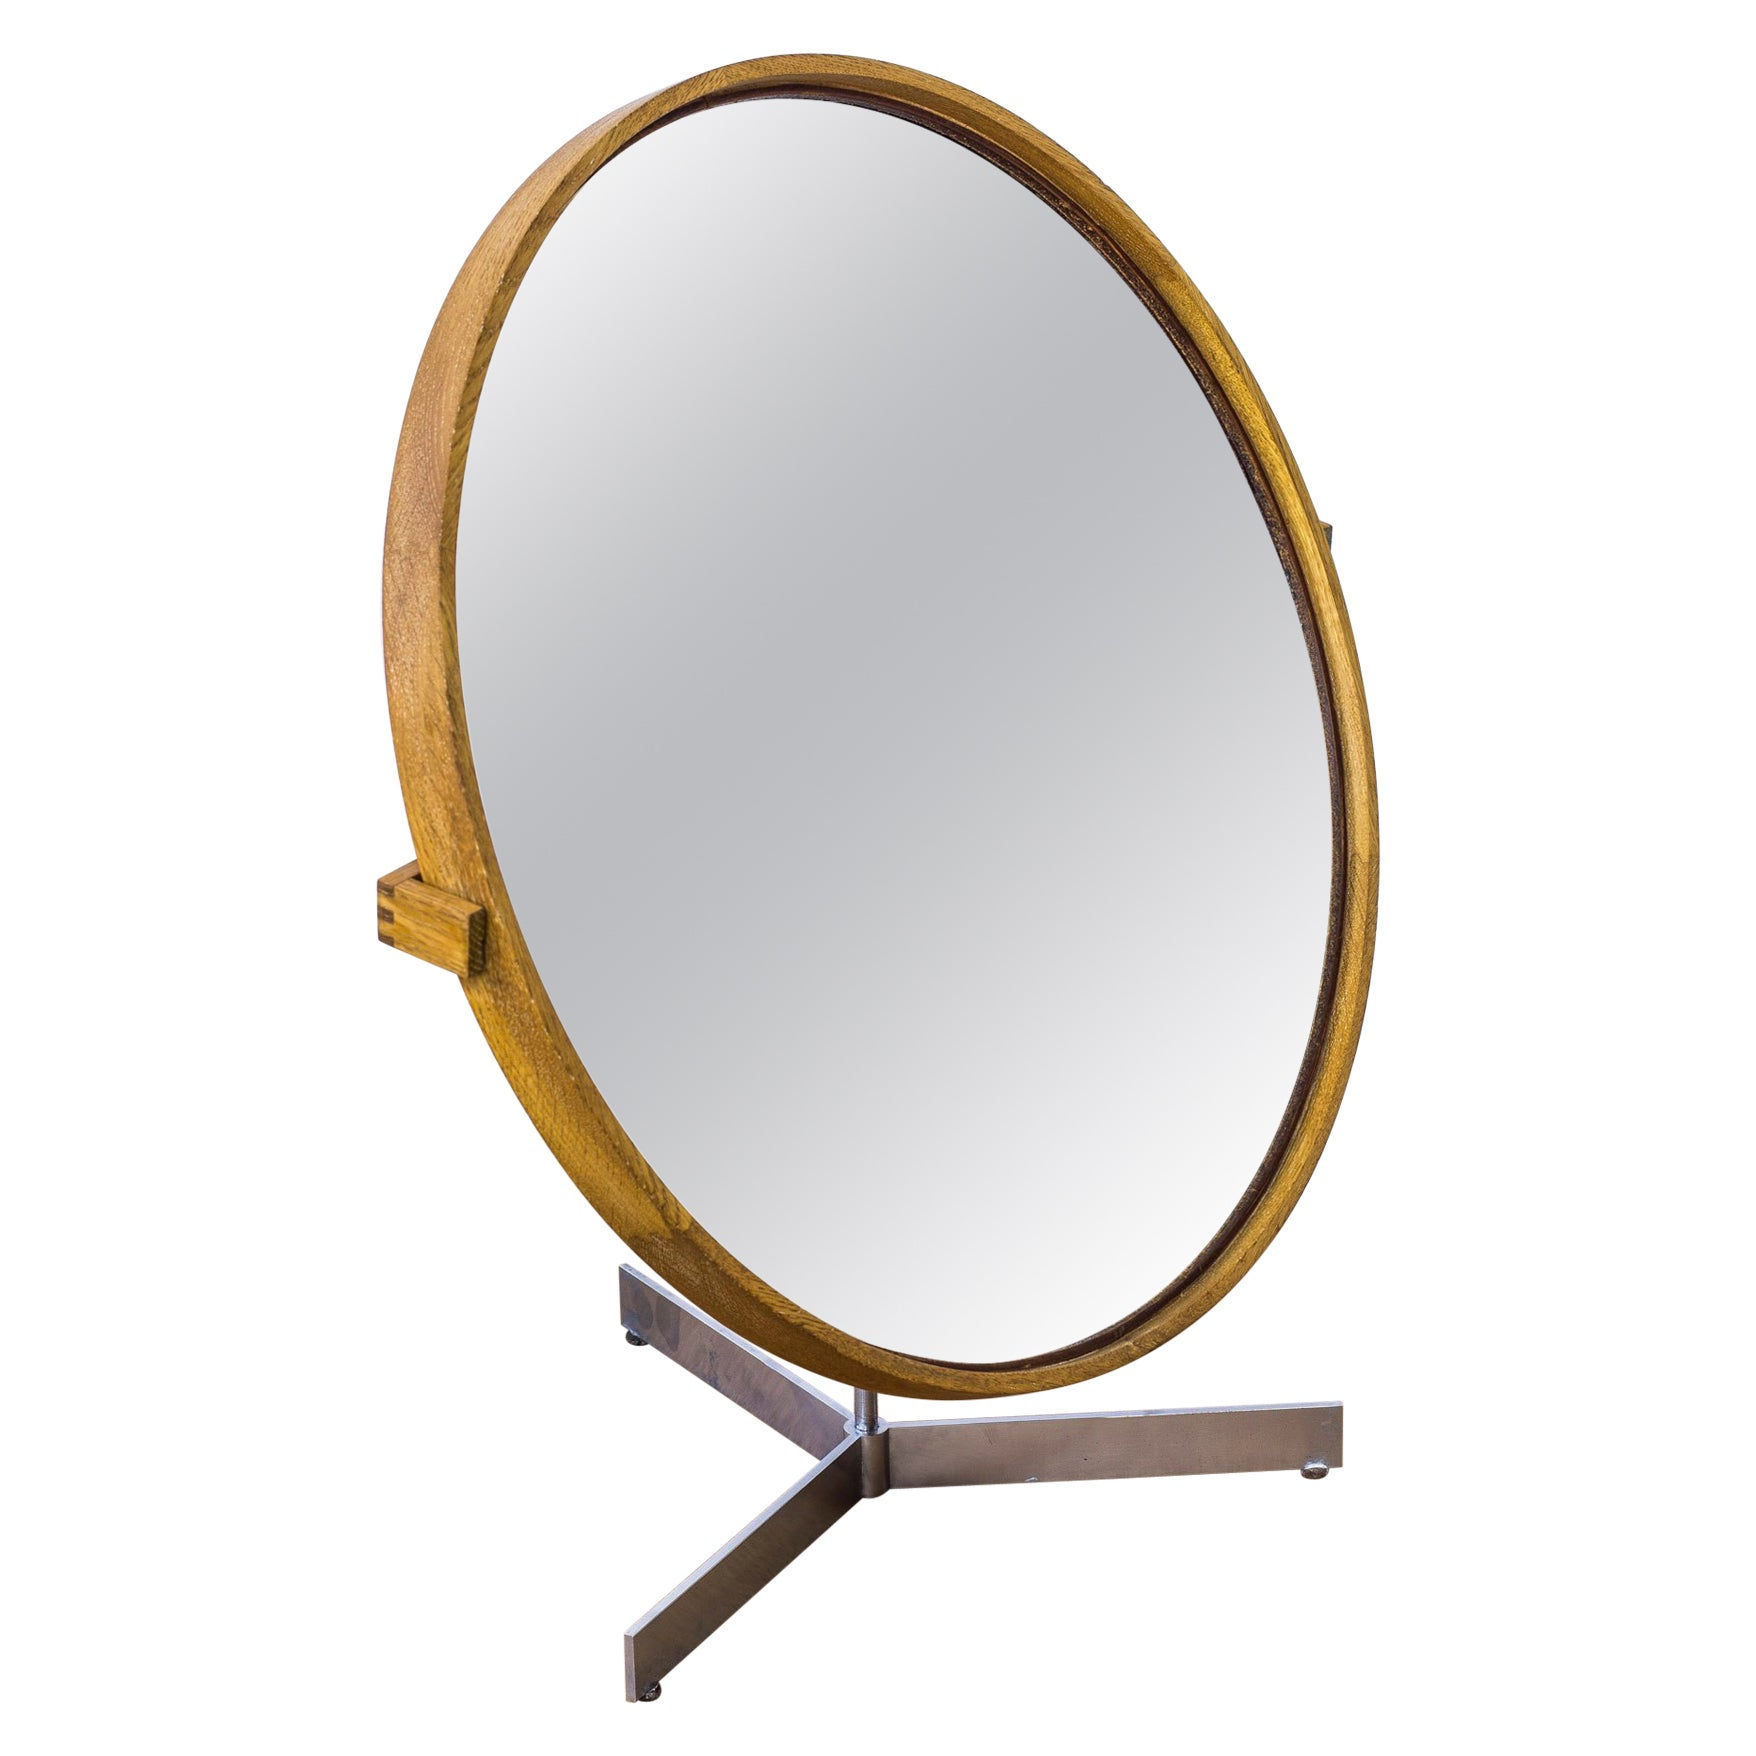 Table Mirror by Uno & Östen Kristiansson for Luxus, Sweden, 1950s